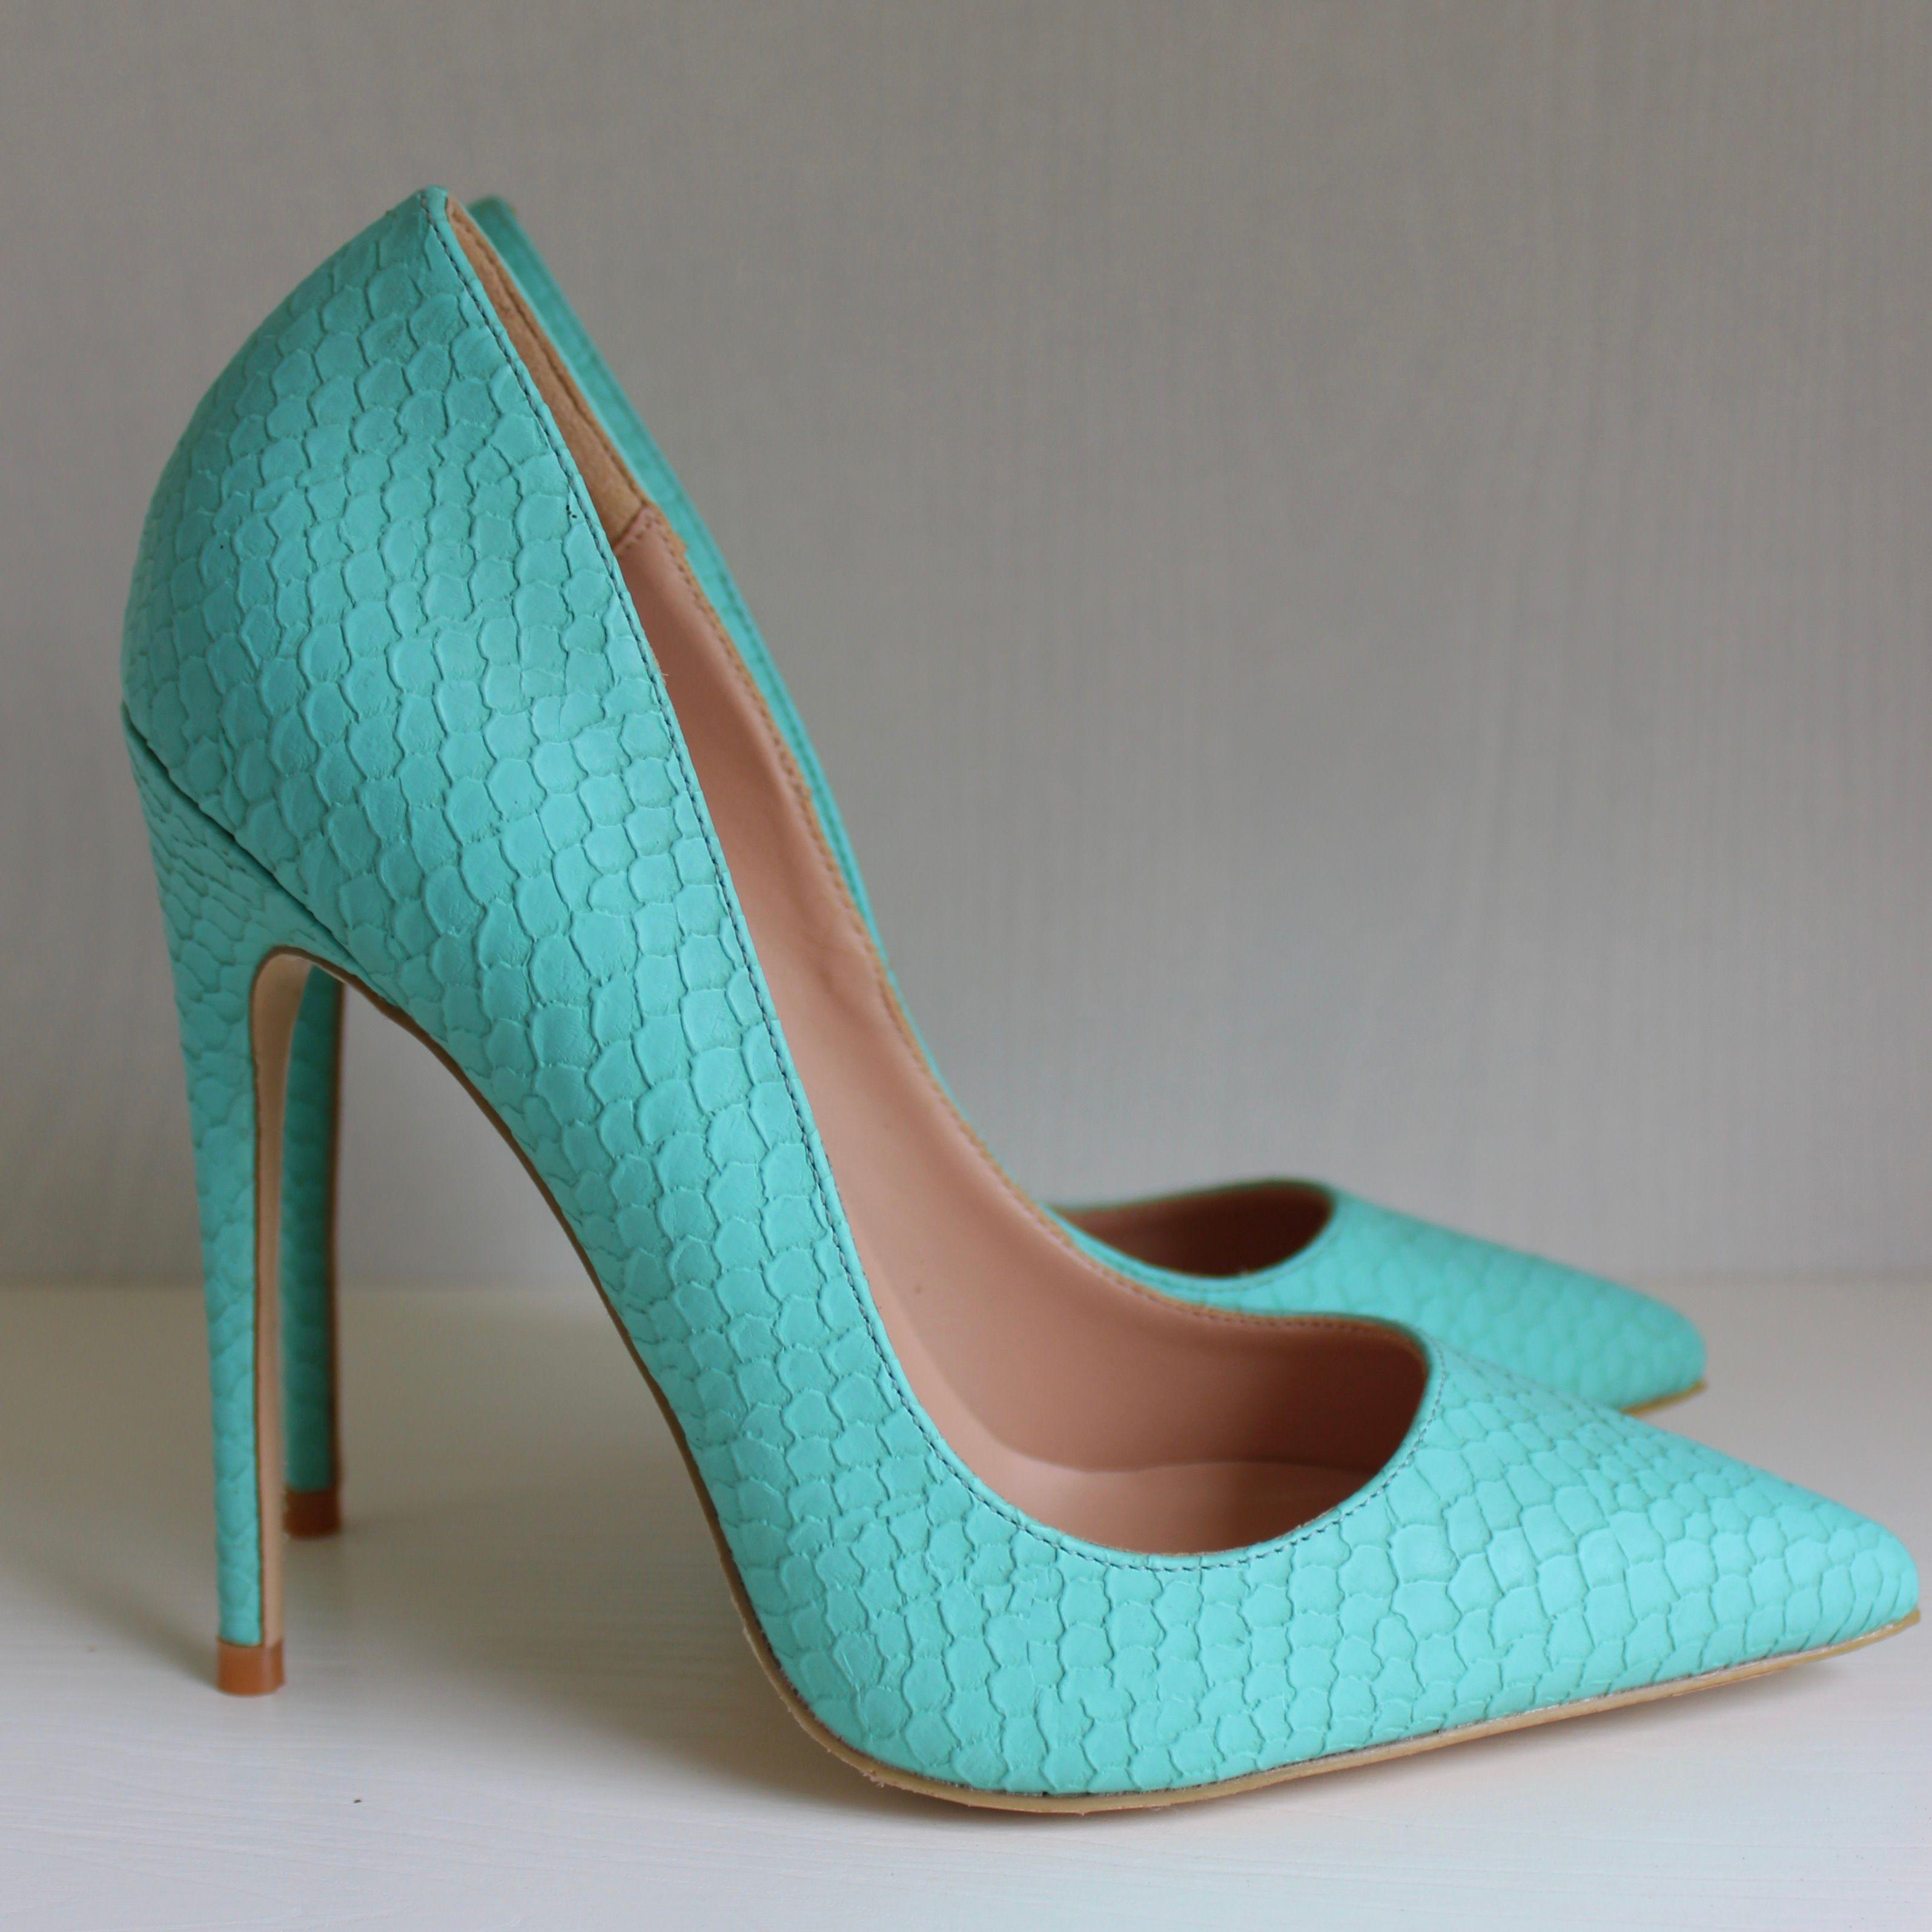 e61445962b5 Free shipping Fashion women Casual Designer sexy lady Mint snake python  pointy toe high heels pumps shoes Stiletto heeled 8cm 10cm 12cm